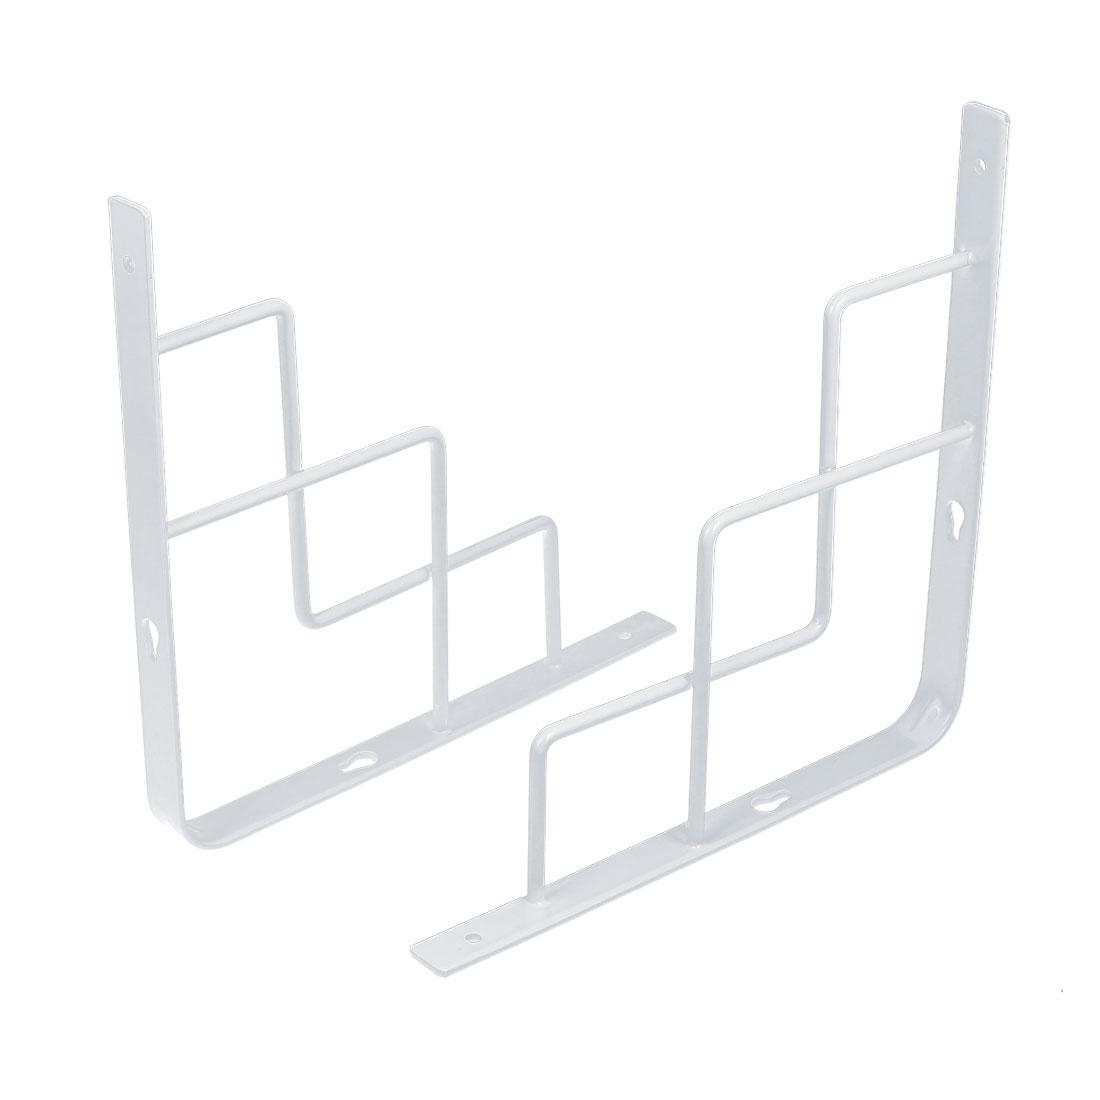 250mm x 250mm Stainless Steel 90 degree Wall Mounted Holder Shelf Bracket 2pcs